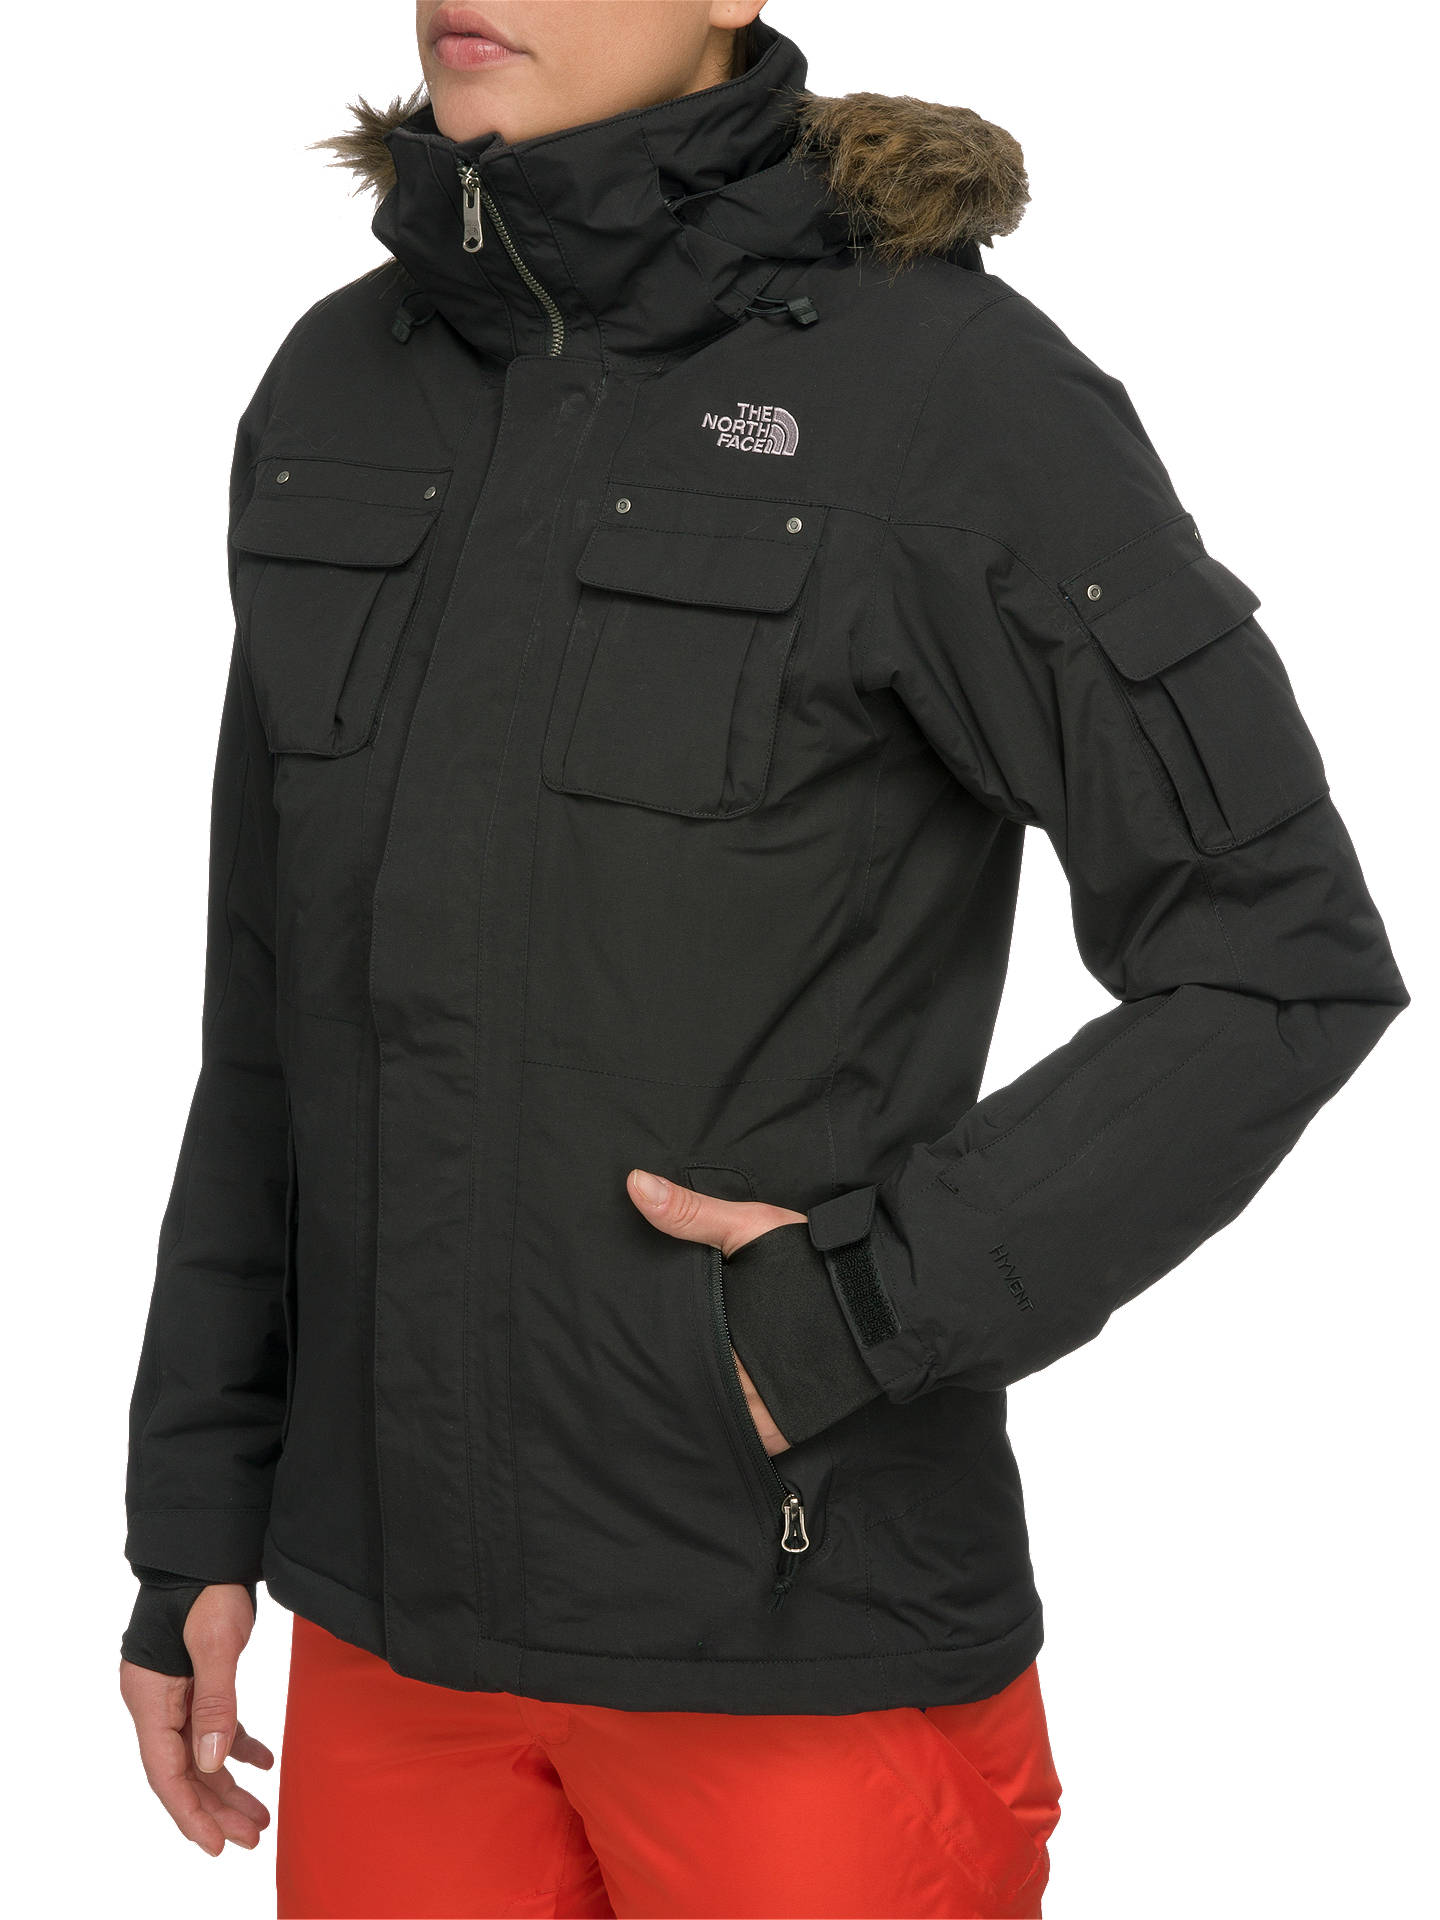 456e257b3 The North Face Baker Women's Jacket, Black at John Lewis & Partners